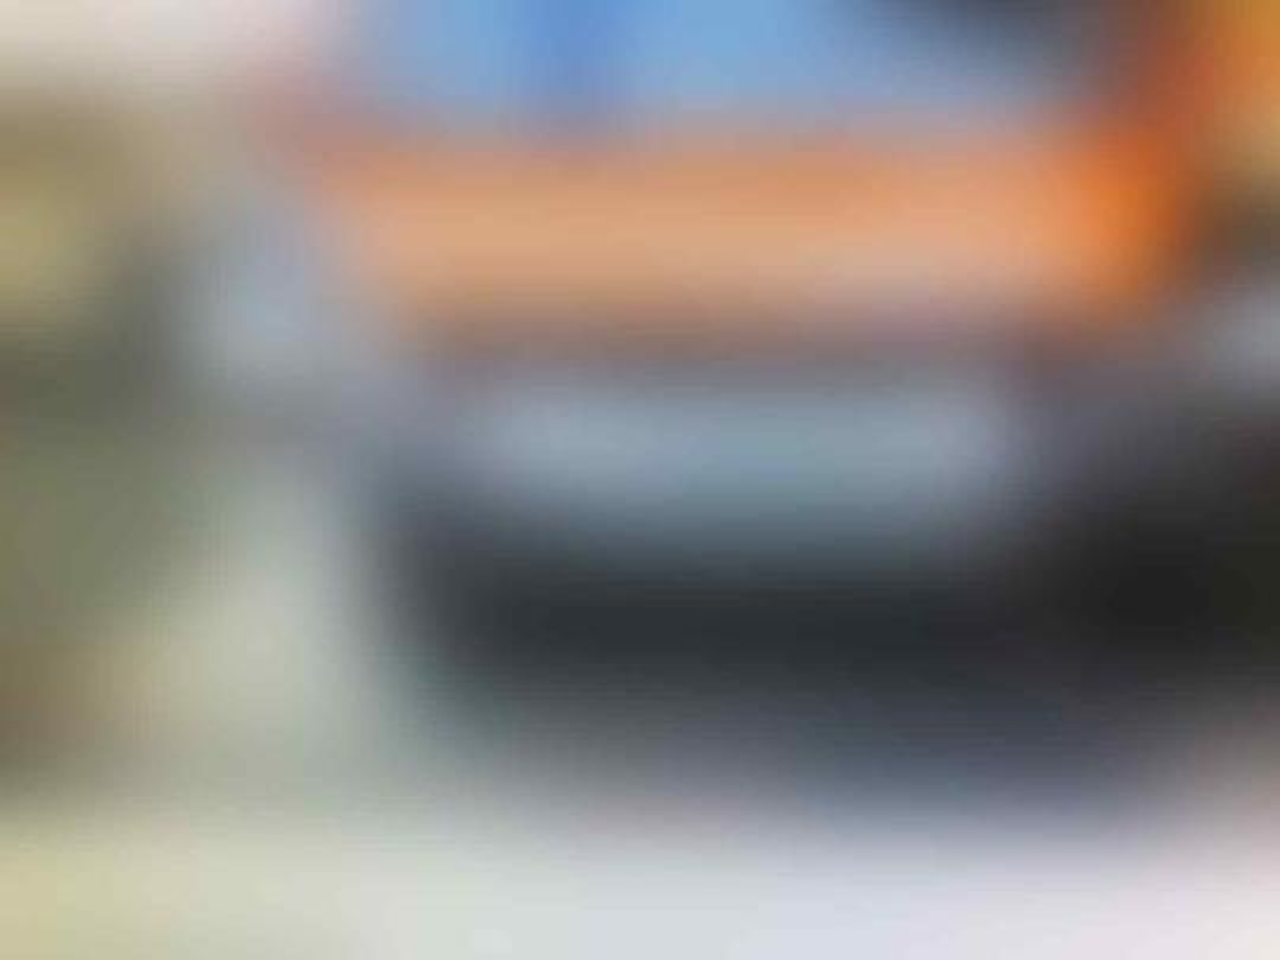 ▀▄▀▄▀▄ Honda Civic FD Community ▄▀▄▀▄▀ - Part 1